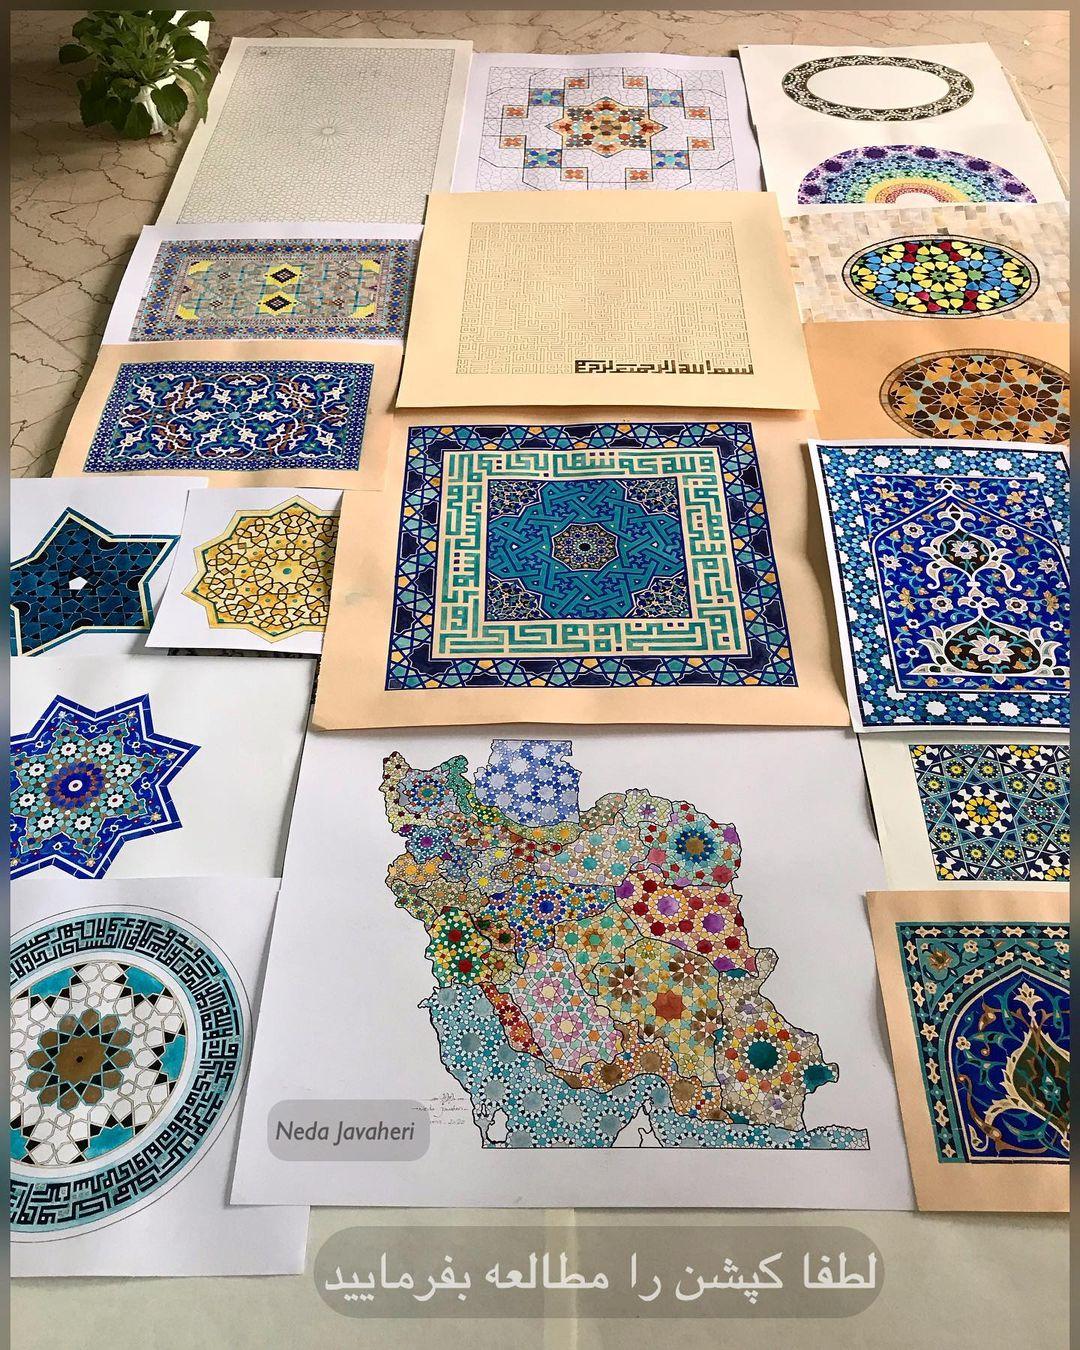 Karya Kaligrafi #stayhome #2020  بچه ها بعد از فایل چالش رنگ، یک سوتفاهمی ایجاد شده که دوستان فک…- Ne Javaher